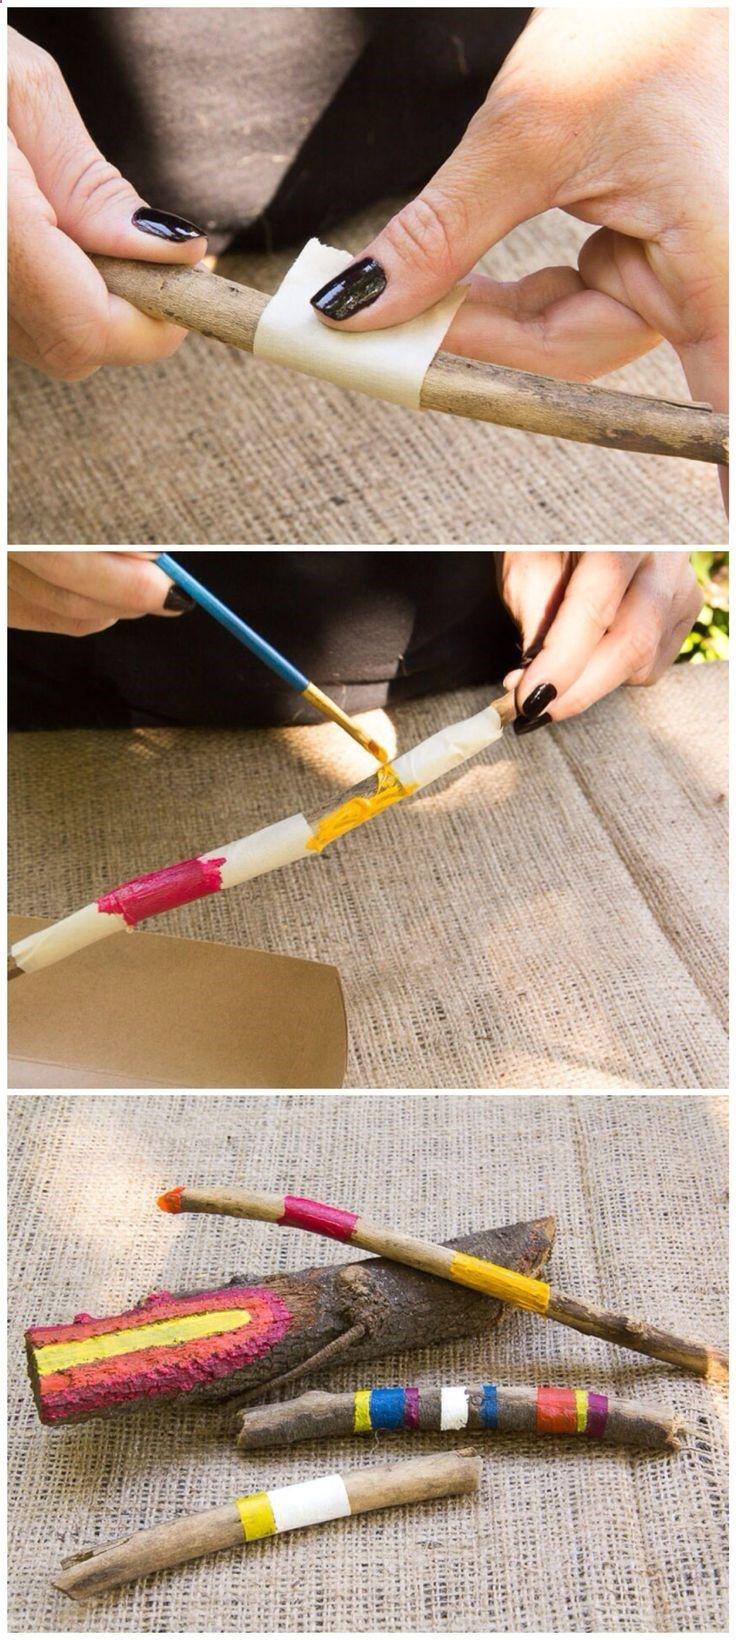 DIY Painted Sticks/Moonfrye/ Nature Crafts/ Crafty/ Kids Art Projects #bemaltestöcke